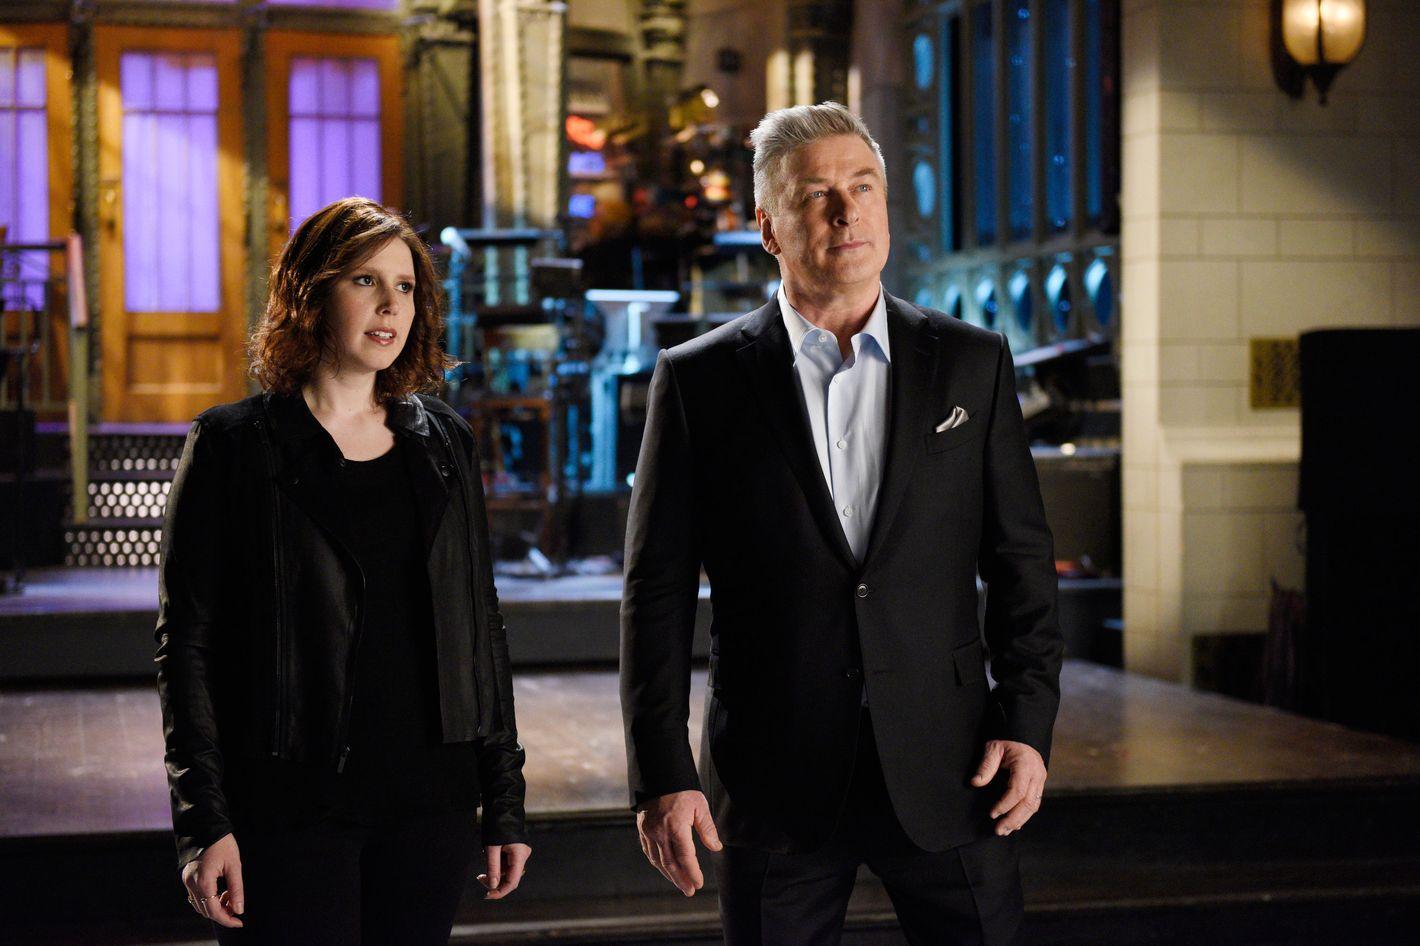 Saturday Night Live Recap: Alec Baldwin Hosts for 17th Time